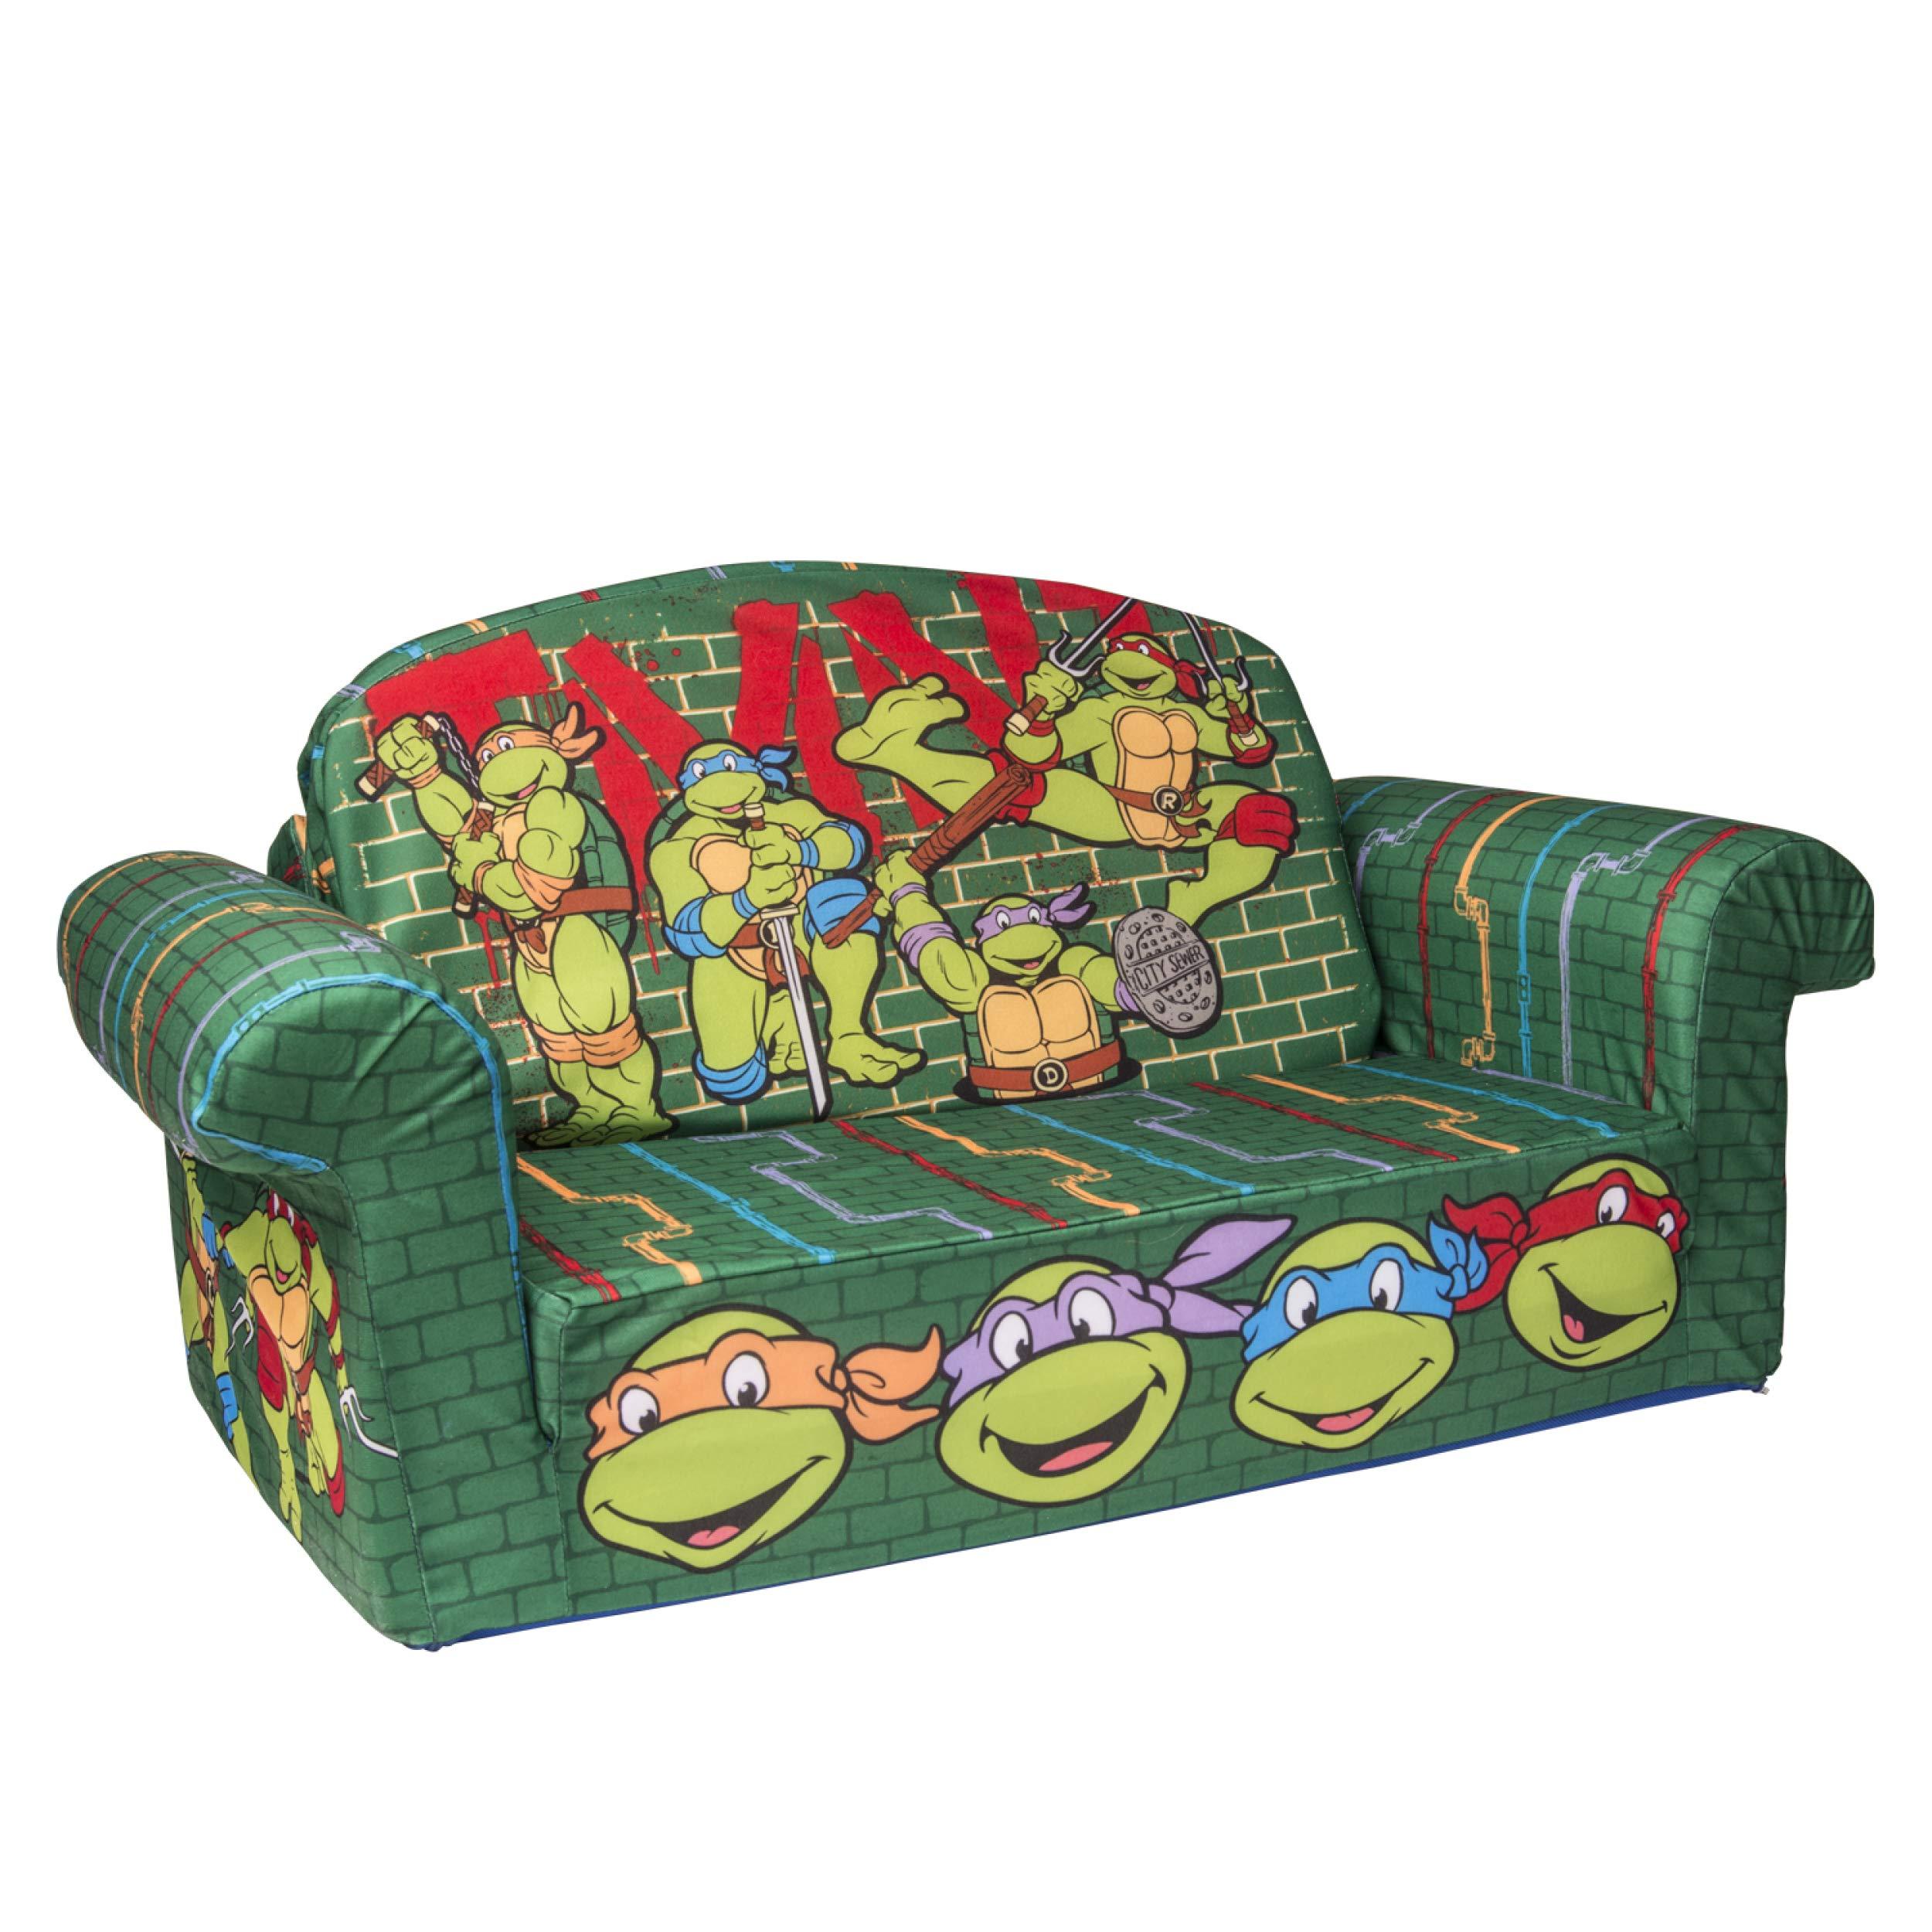 Marshmallow Furniture Children S 2 In 1 Flip Open Foam